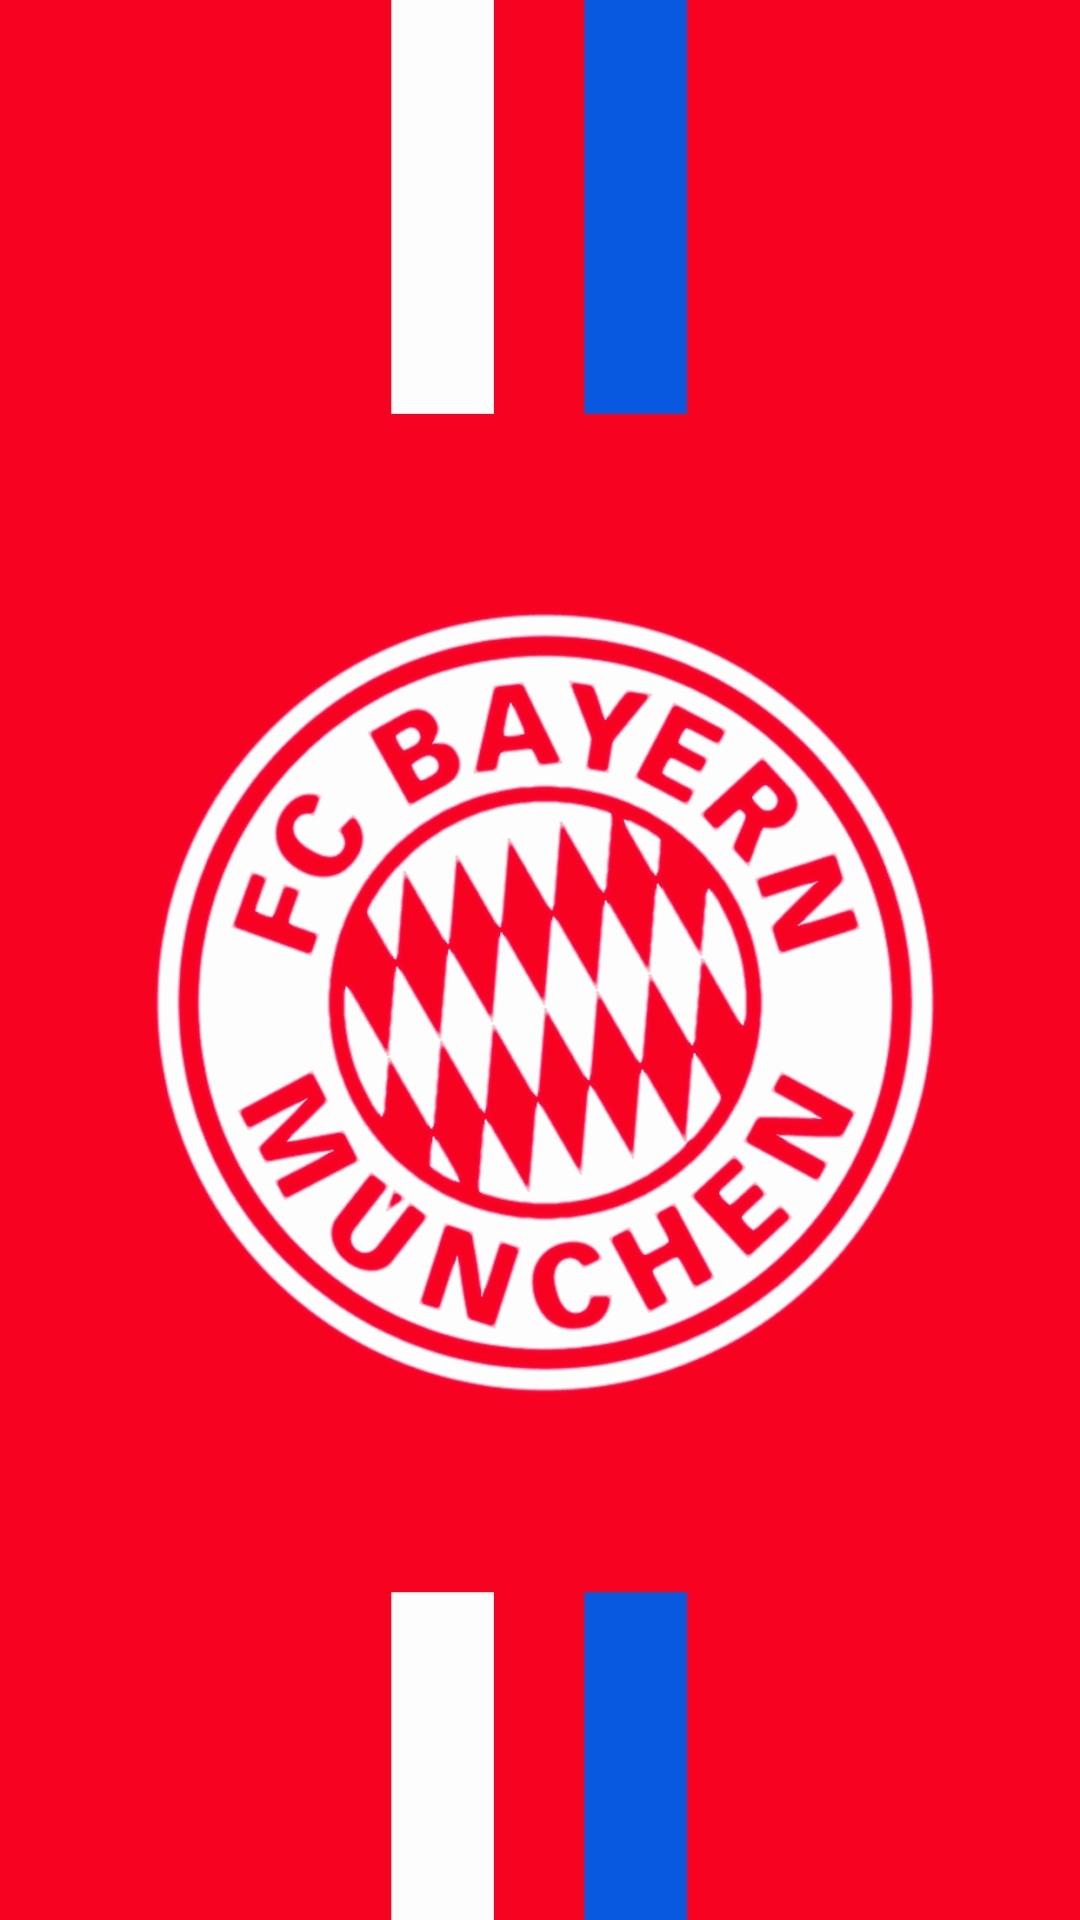 bayern munich iphone wallpapers – weneedfun